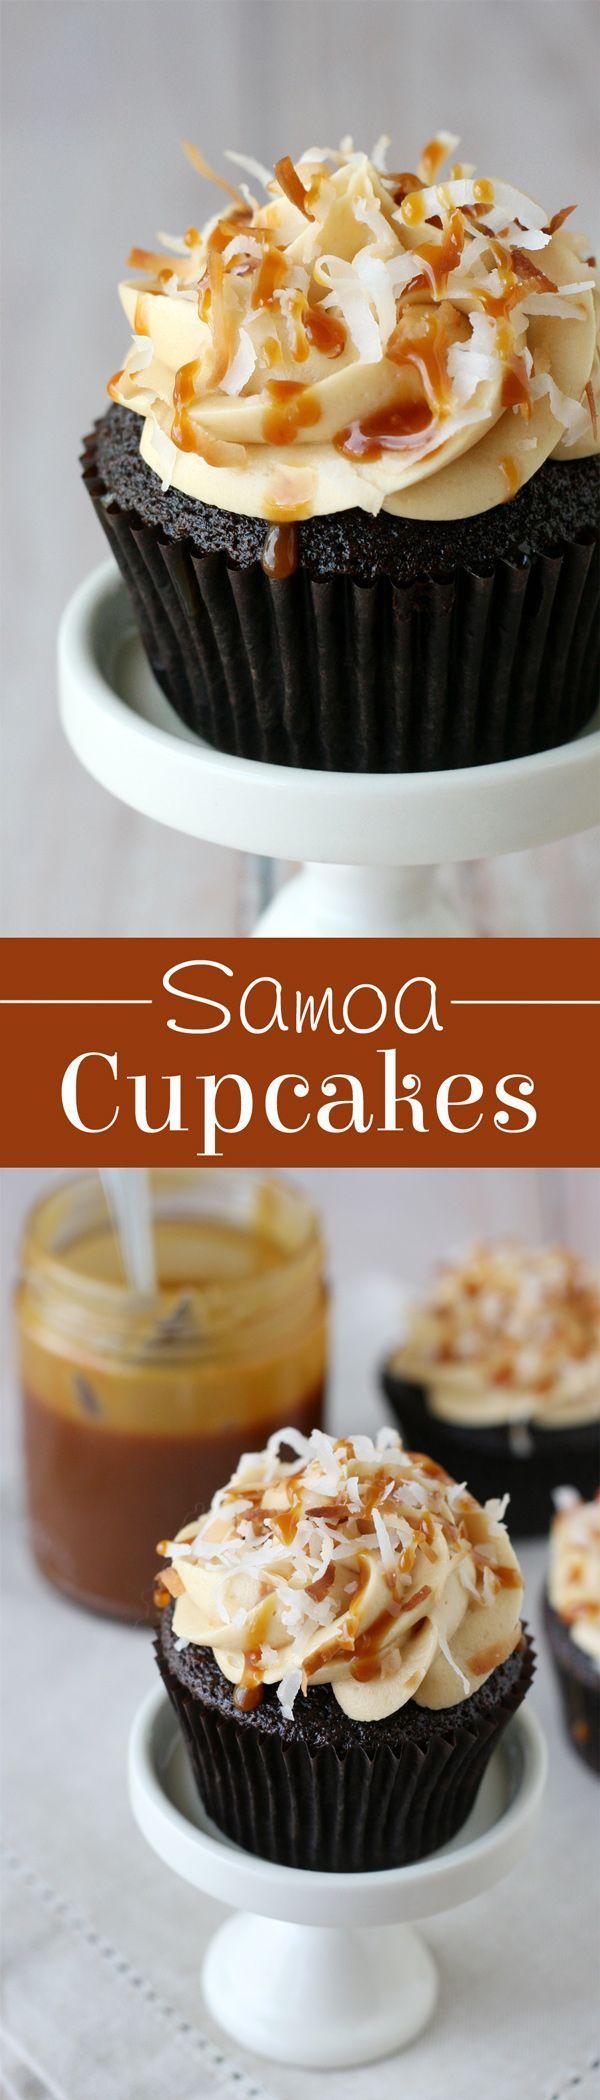 Samoa Cupcakes - Glorious Treats